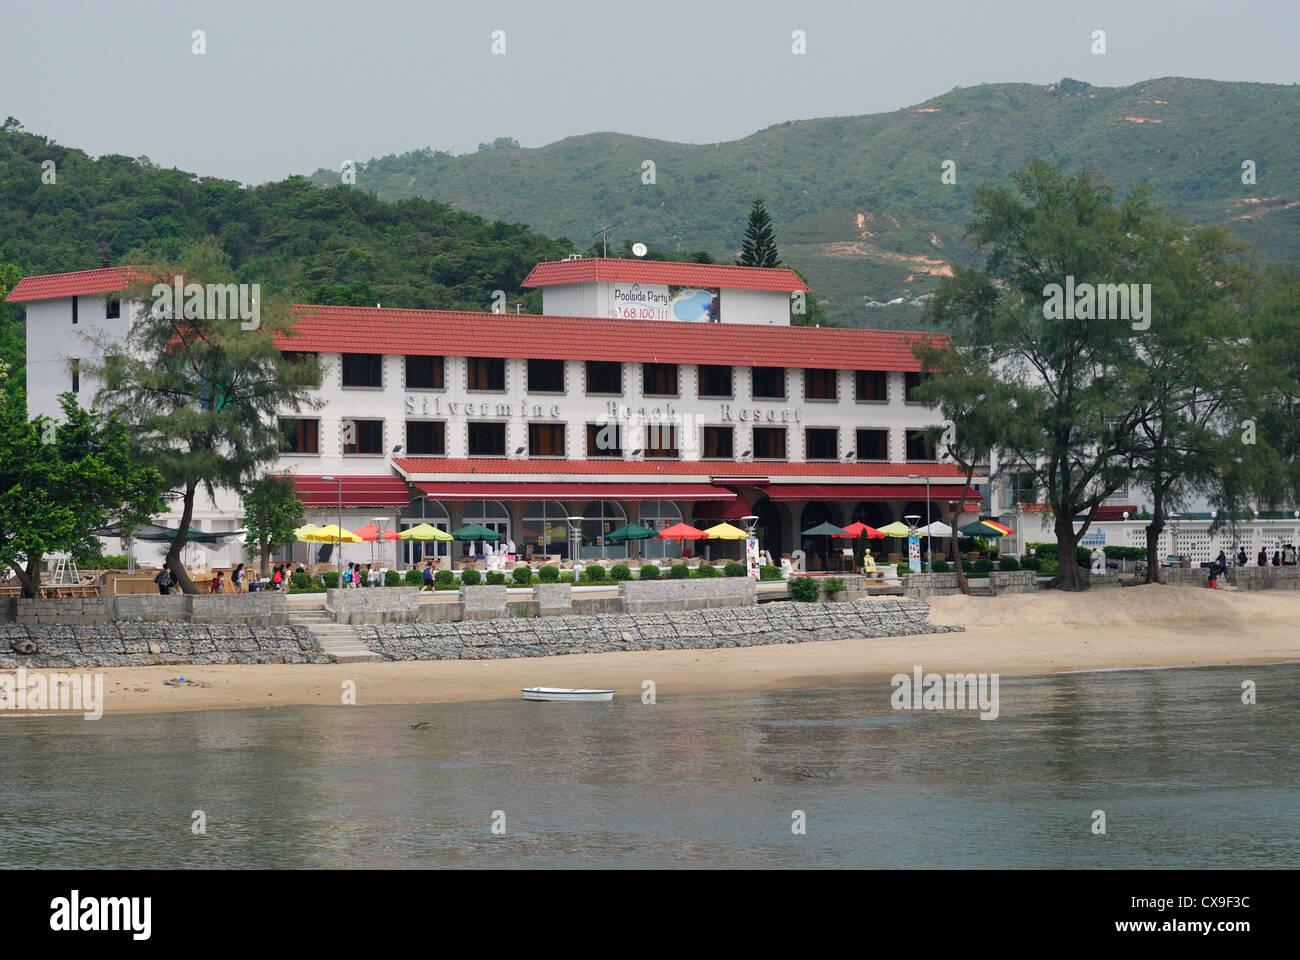 Silvermine Bay Resort, Mui Wo Lantau Island, Hong Kong. - Stock Image